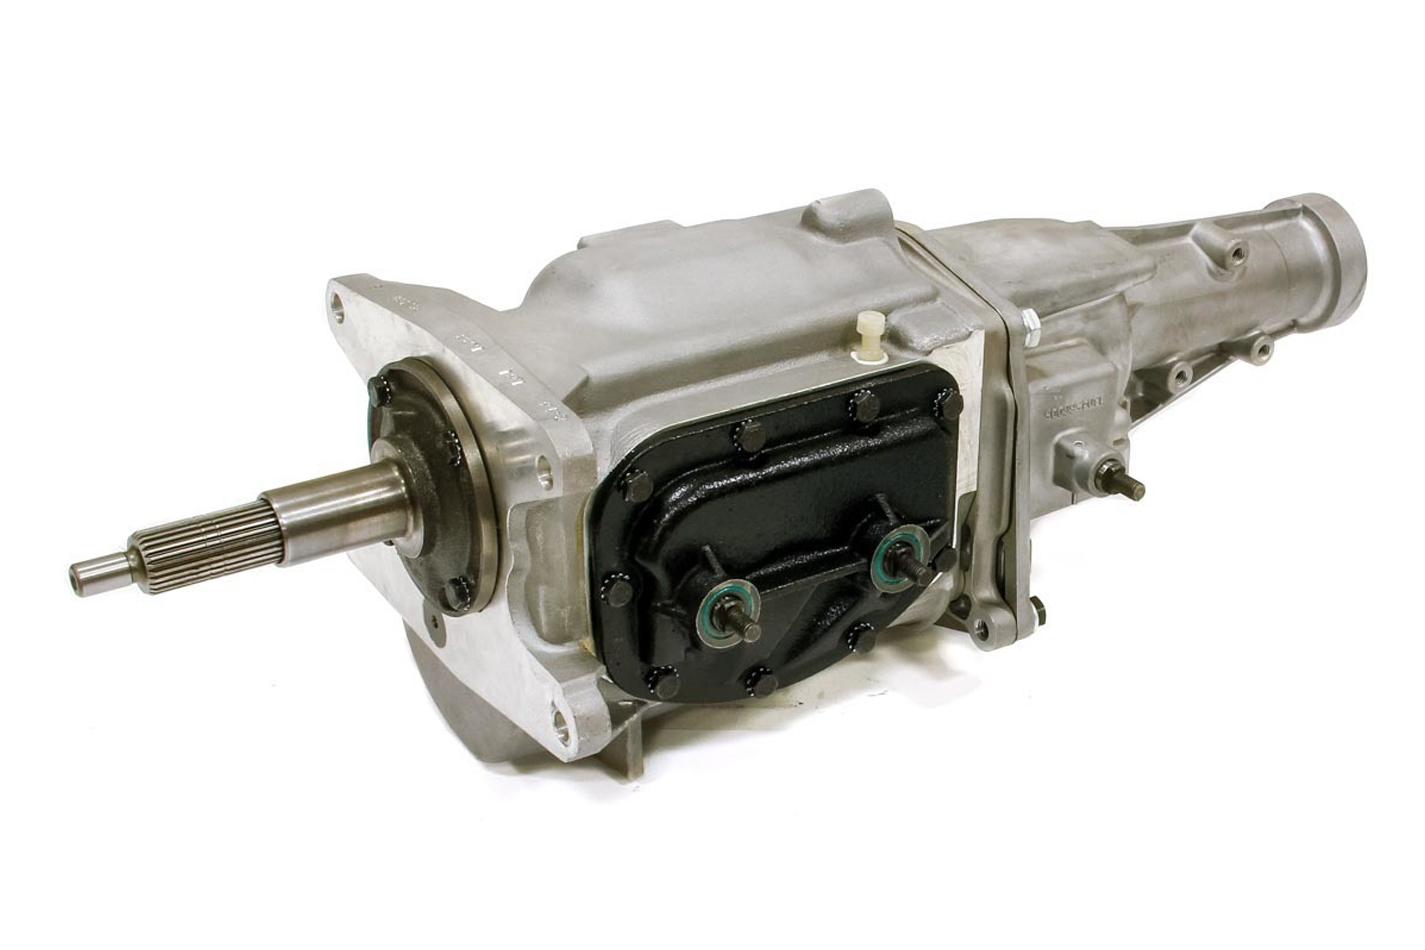 Richmond 1304000070 Transmission, Super T10, Manual, 4 Speed, 26 Input Spline, 32 Output Spline, Aluminum, GM, Kit